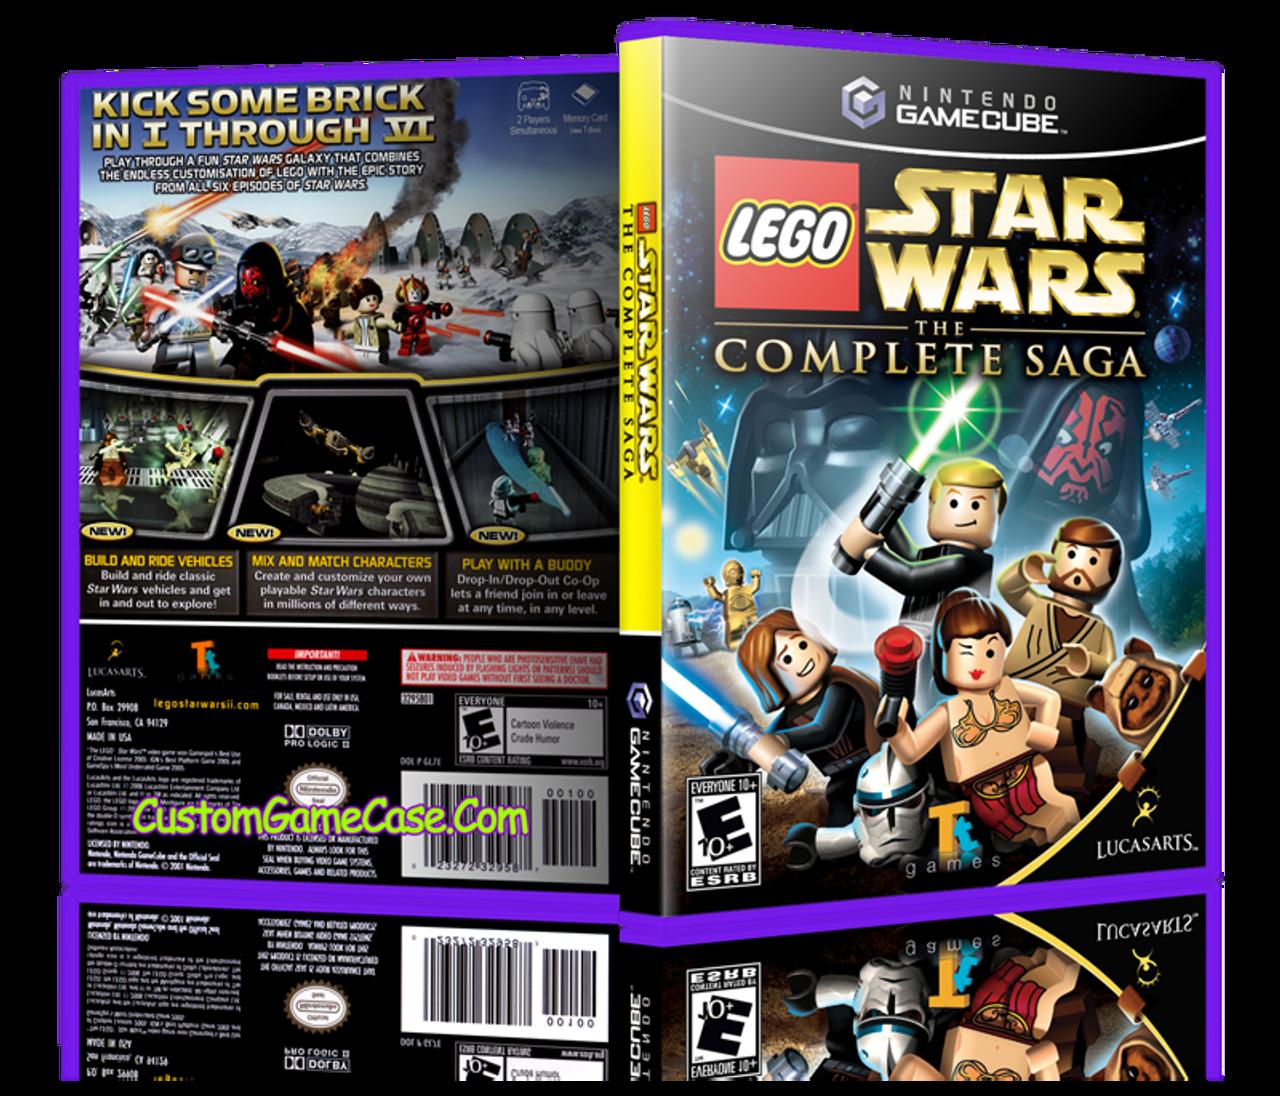 LEGO Star Wars The Complete Saga - Nintendo GameCube GC - Empty ...